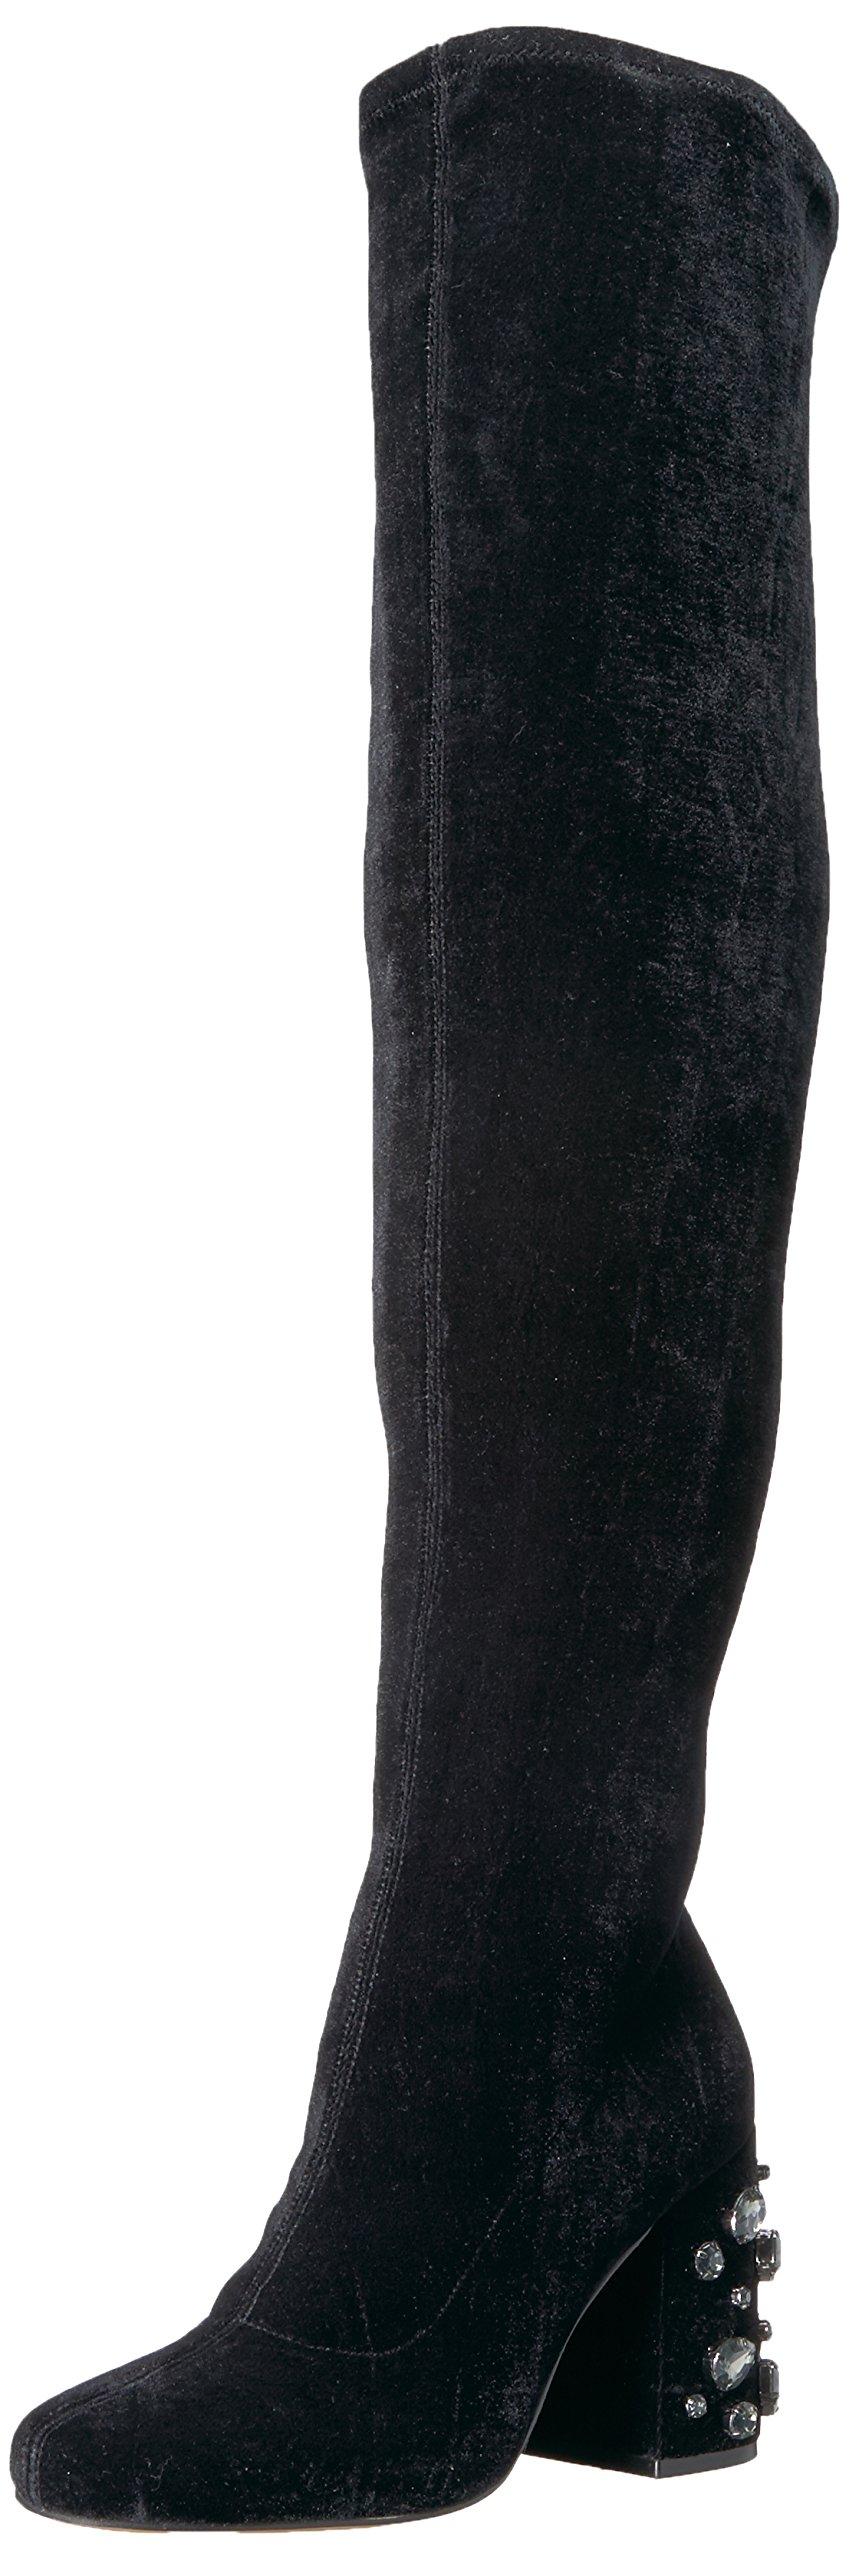 The Fix Women's Sophia Embellished Block Heel Over-The-Knee Boot, Black, 10 B US